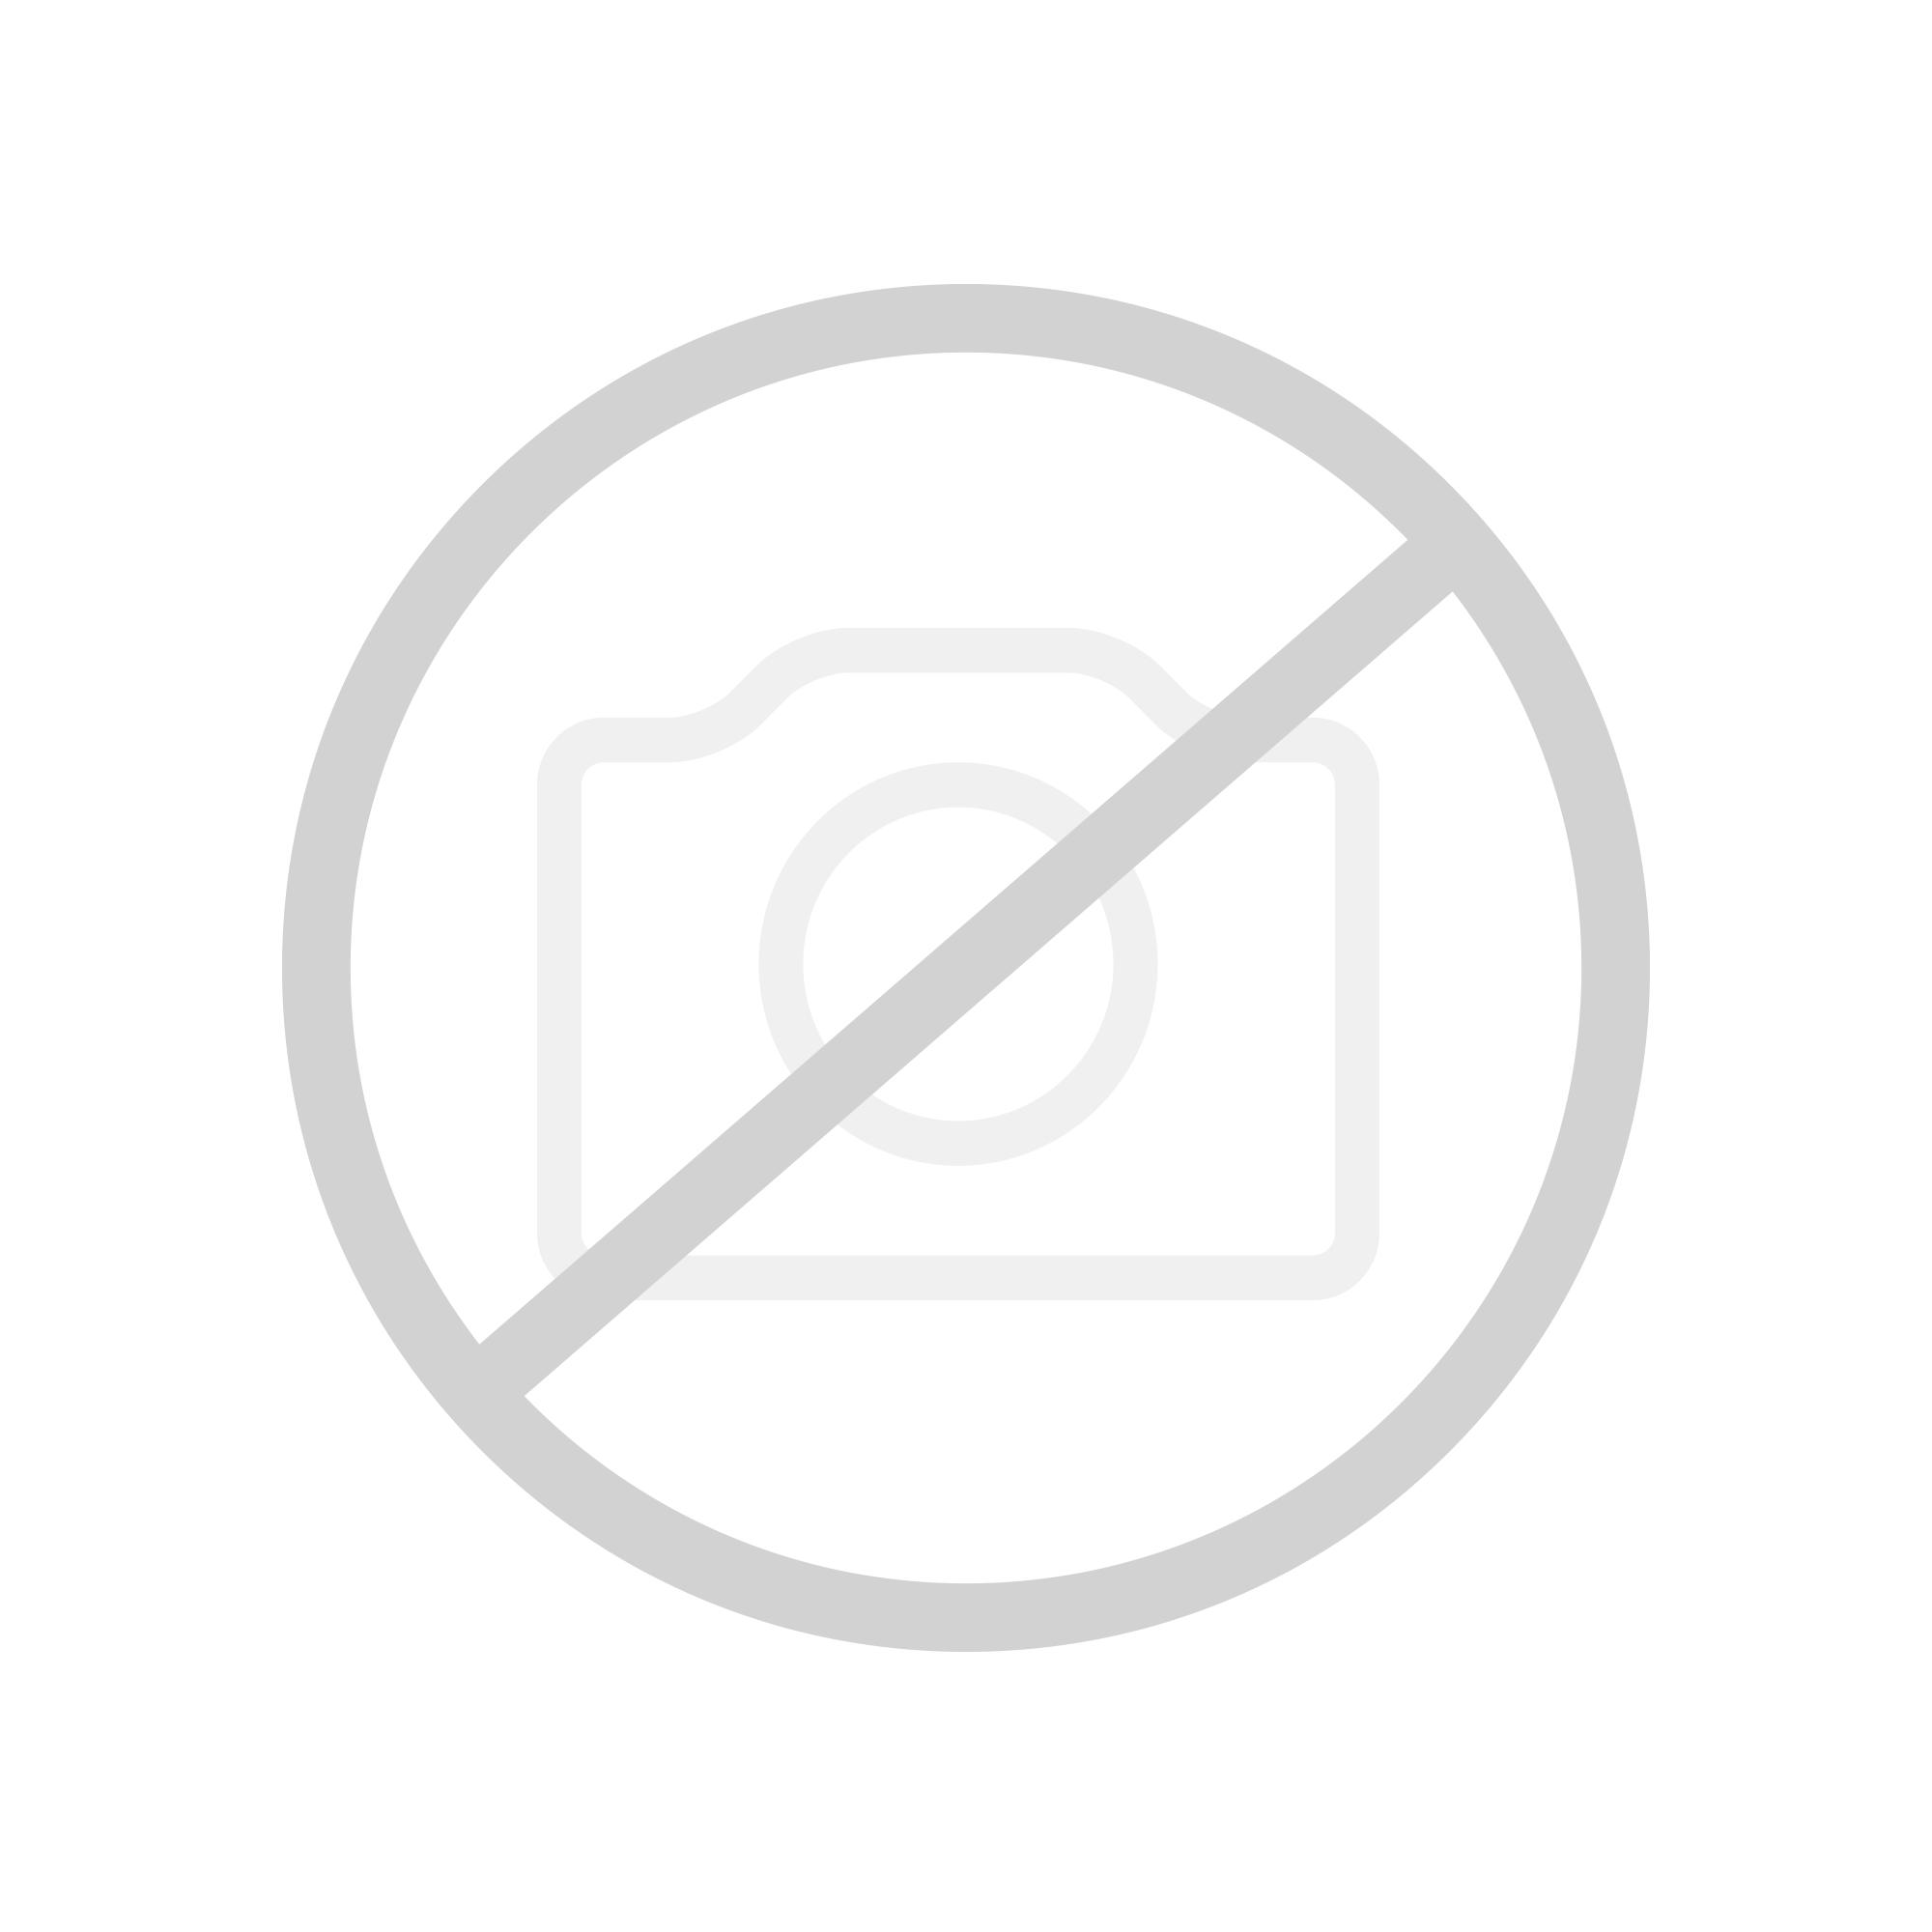 antoniolupi PLAY72 Handtuchstange